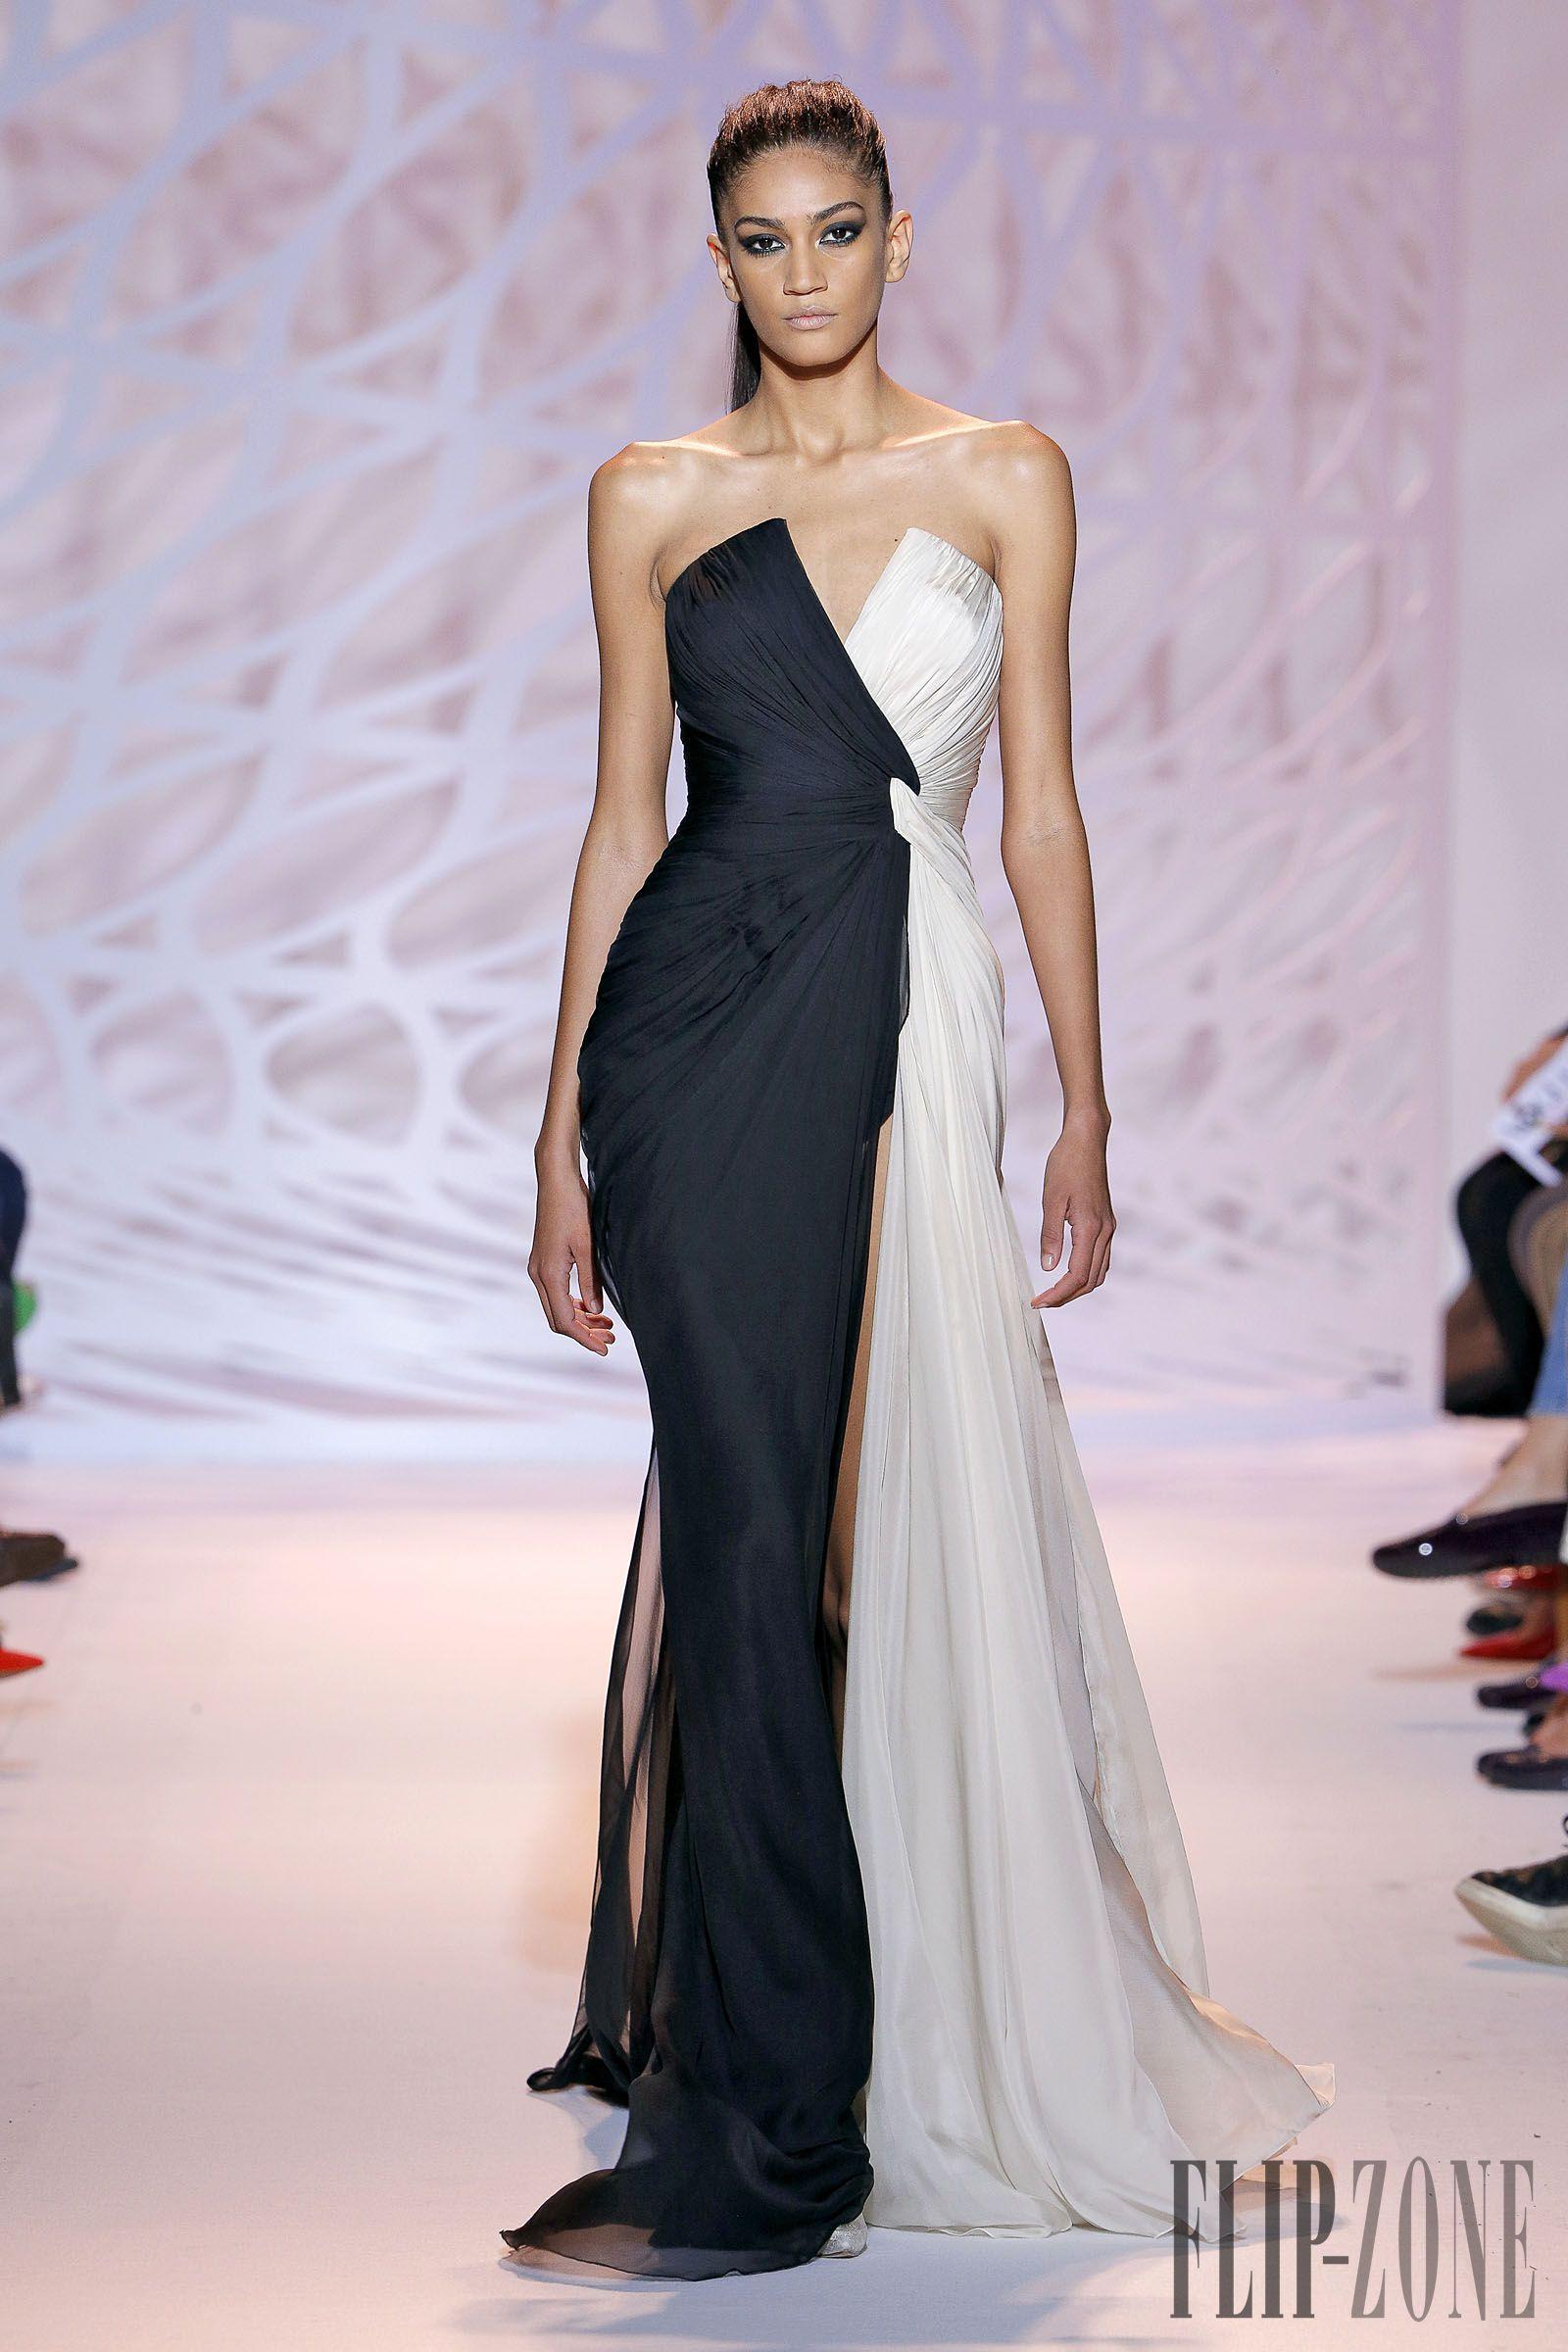 Pin by elisabetta fedi on dream dresses pinterest zuhair murad